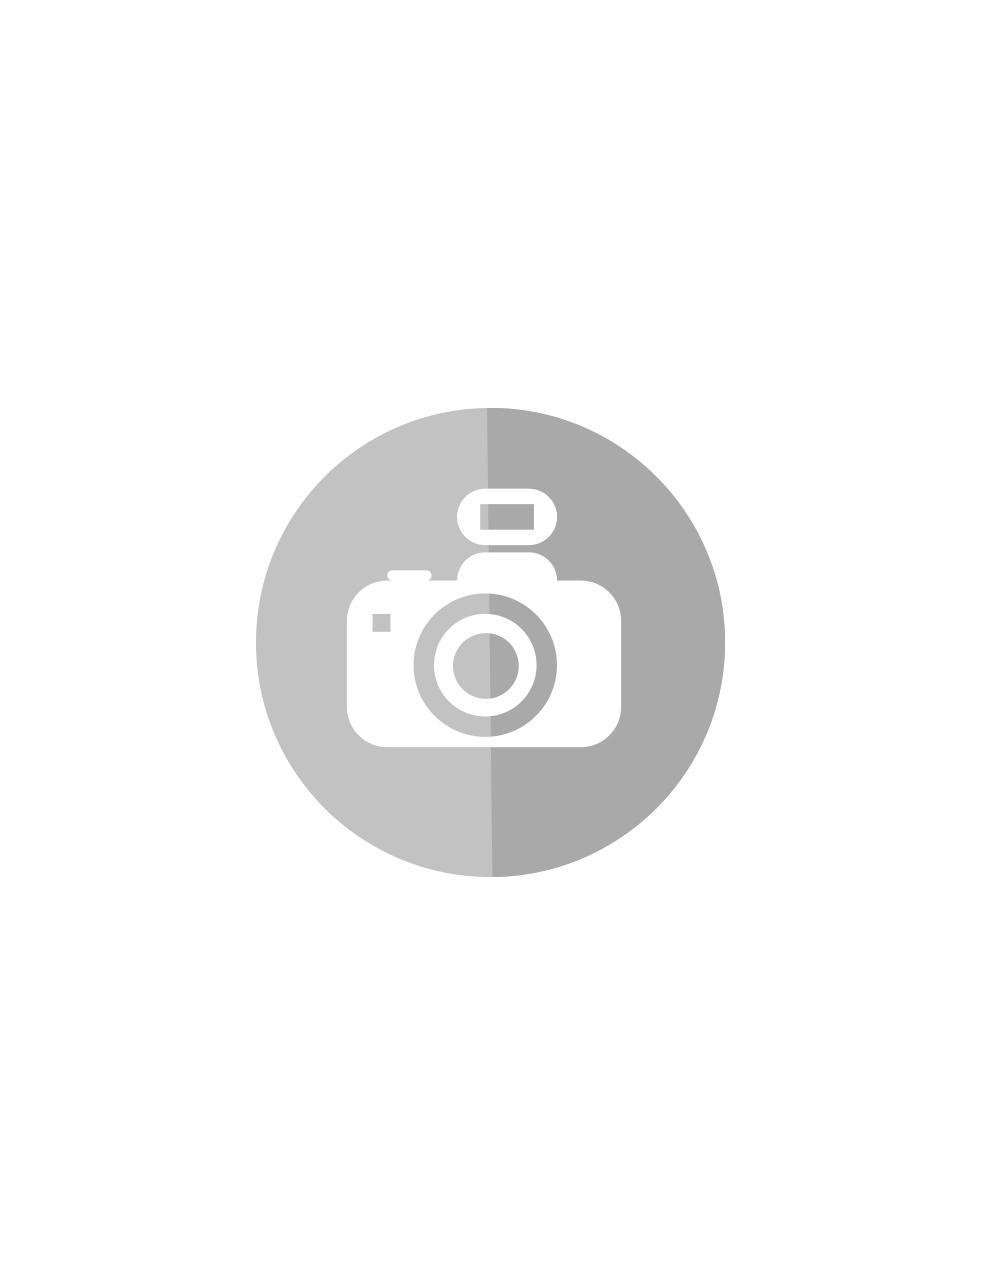 60652880_sparepart/FLAT BED CAR 1.2.3